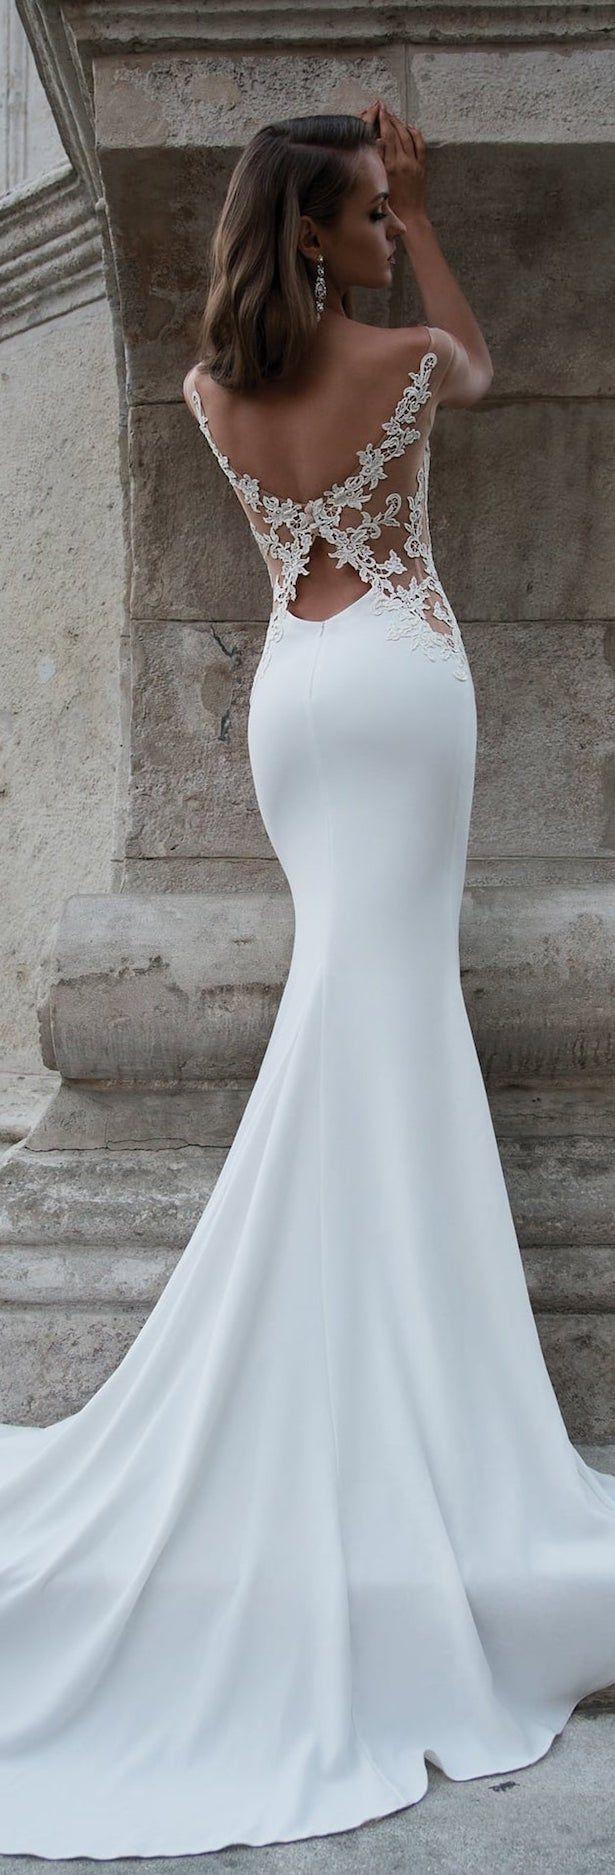 Dominiss Wedding Dresses 2017 | Vestidos de novia, De novia y Novios